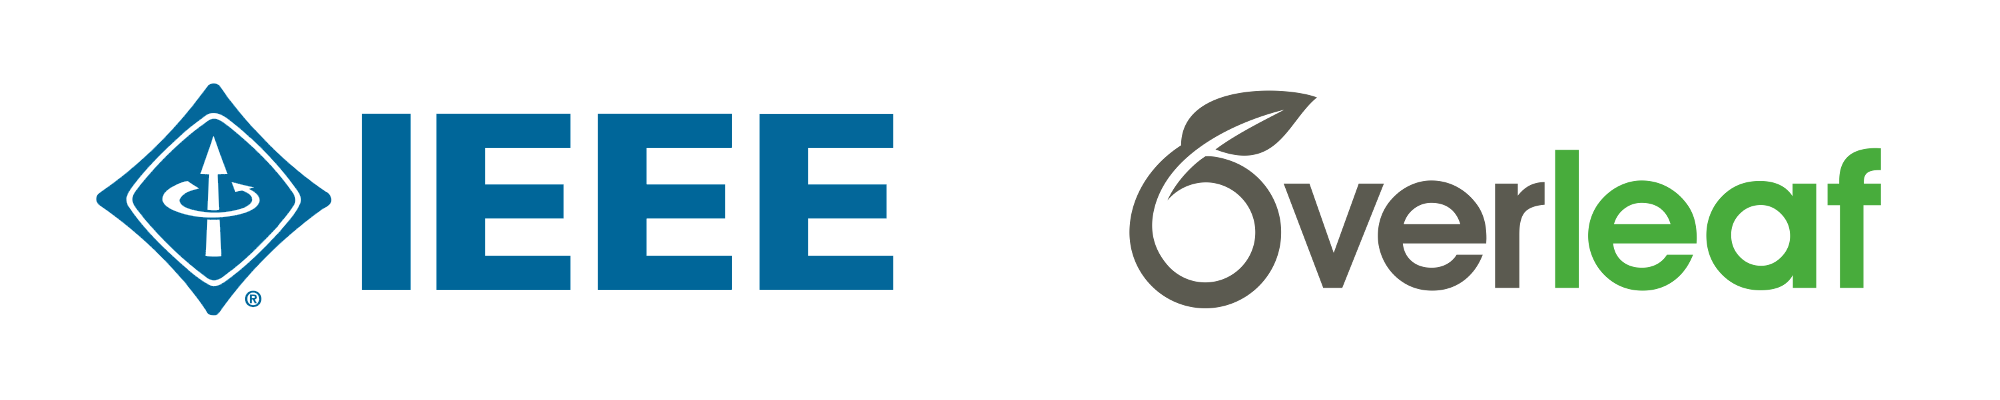 Overleaf IEEE logo header